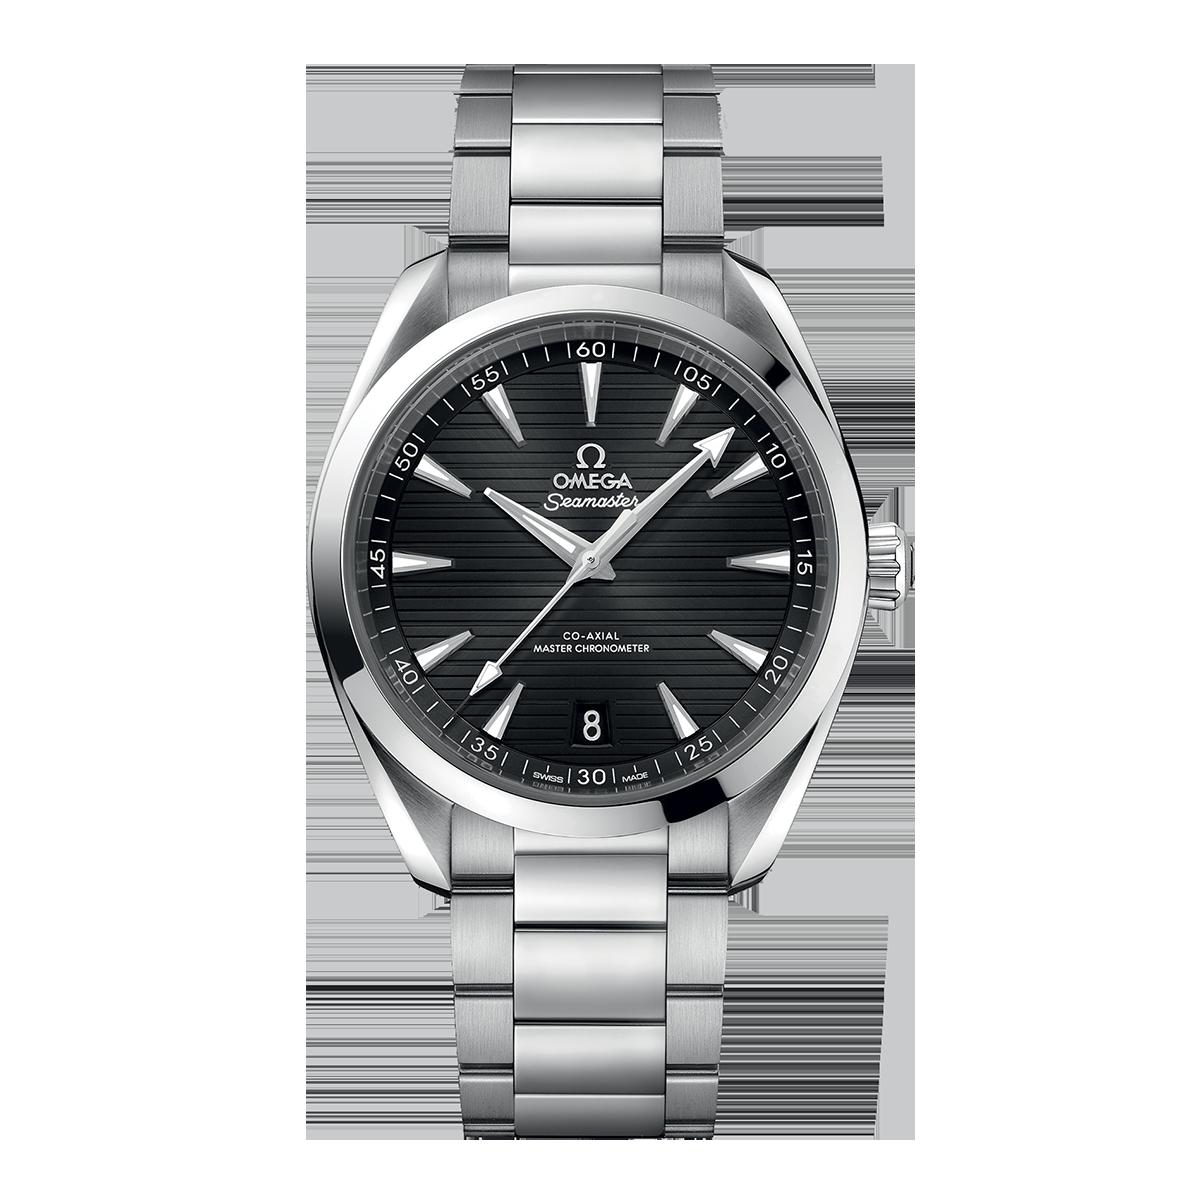 omega-seamaster-aqua-terra-150m-omega-co-axial-41-mm-22010412101001-1_hos Jarl Sandin